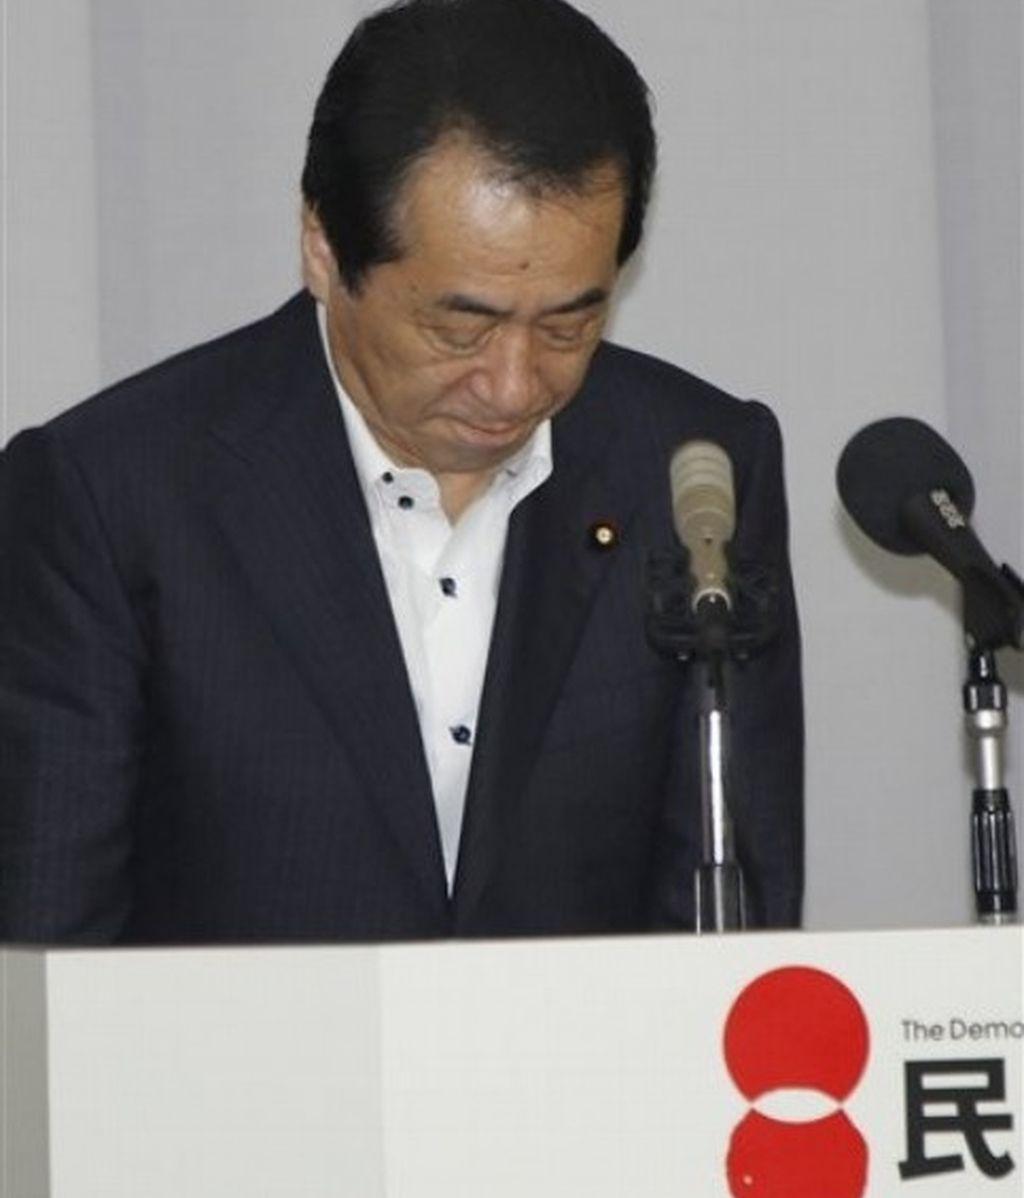 Imagen de archivo del primer ministro japonés, Naoto Kan